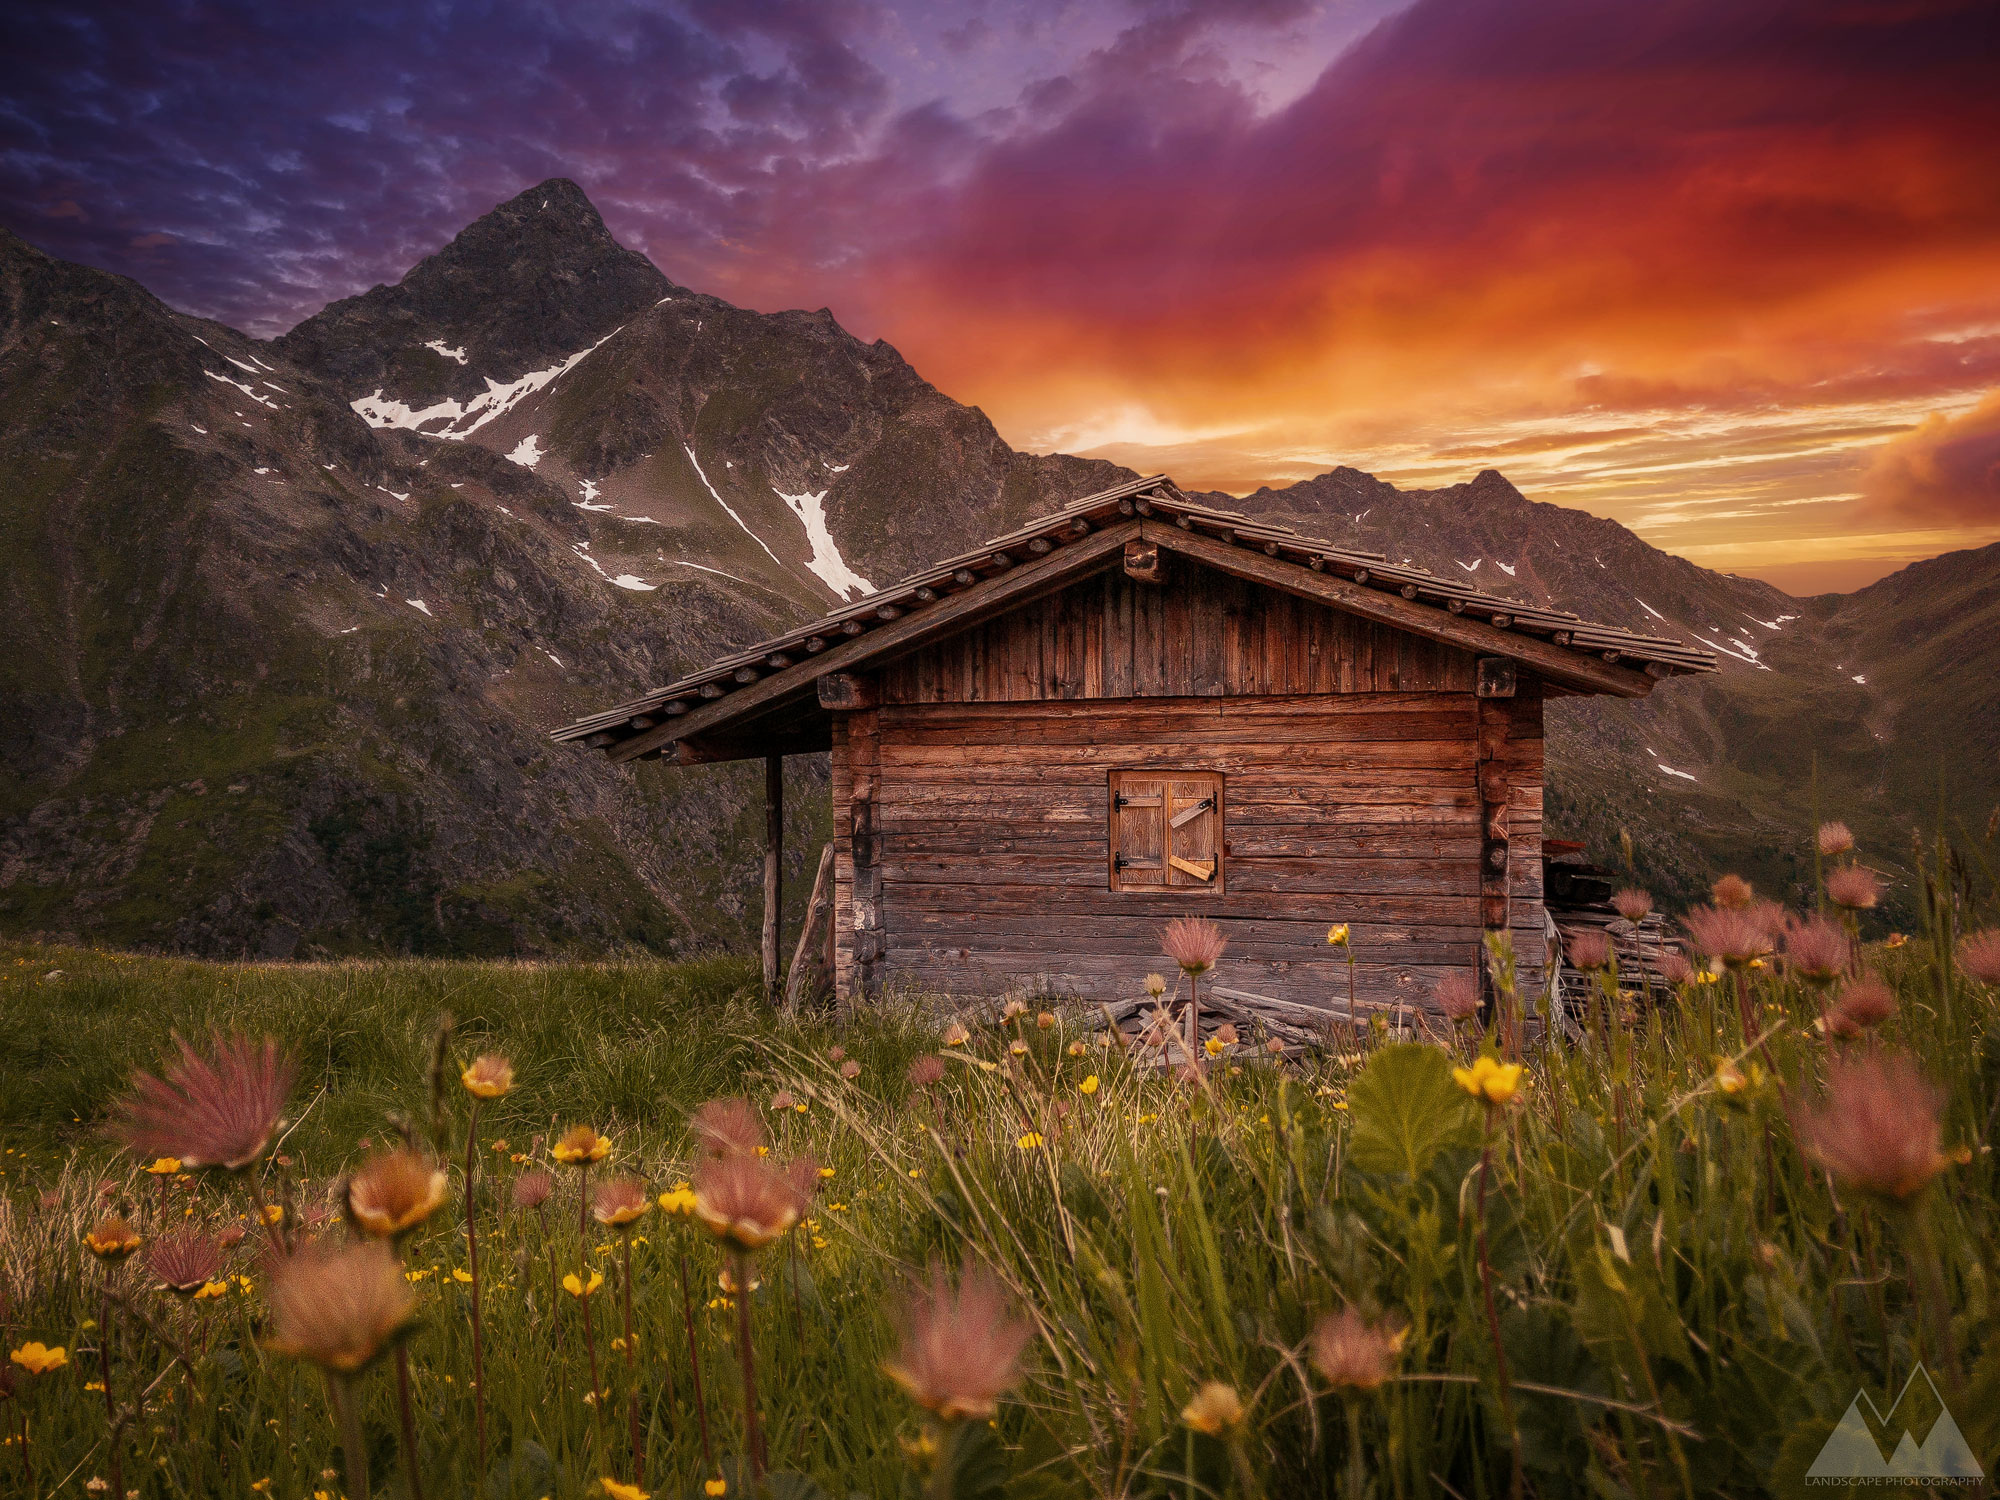 at Mooseralm, Austria